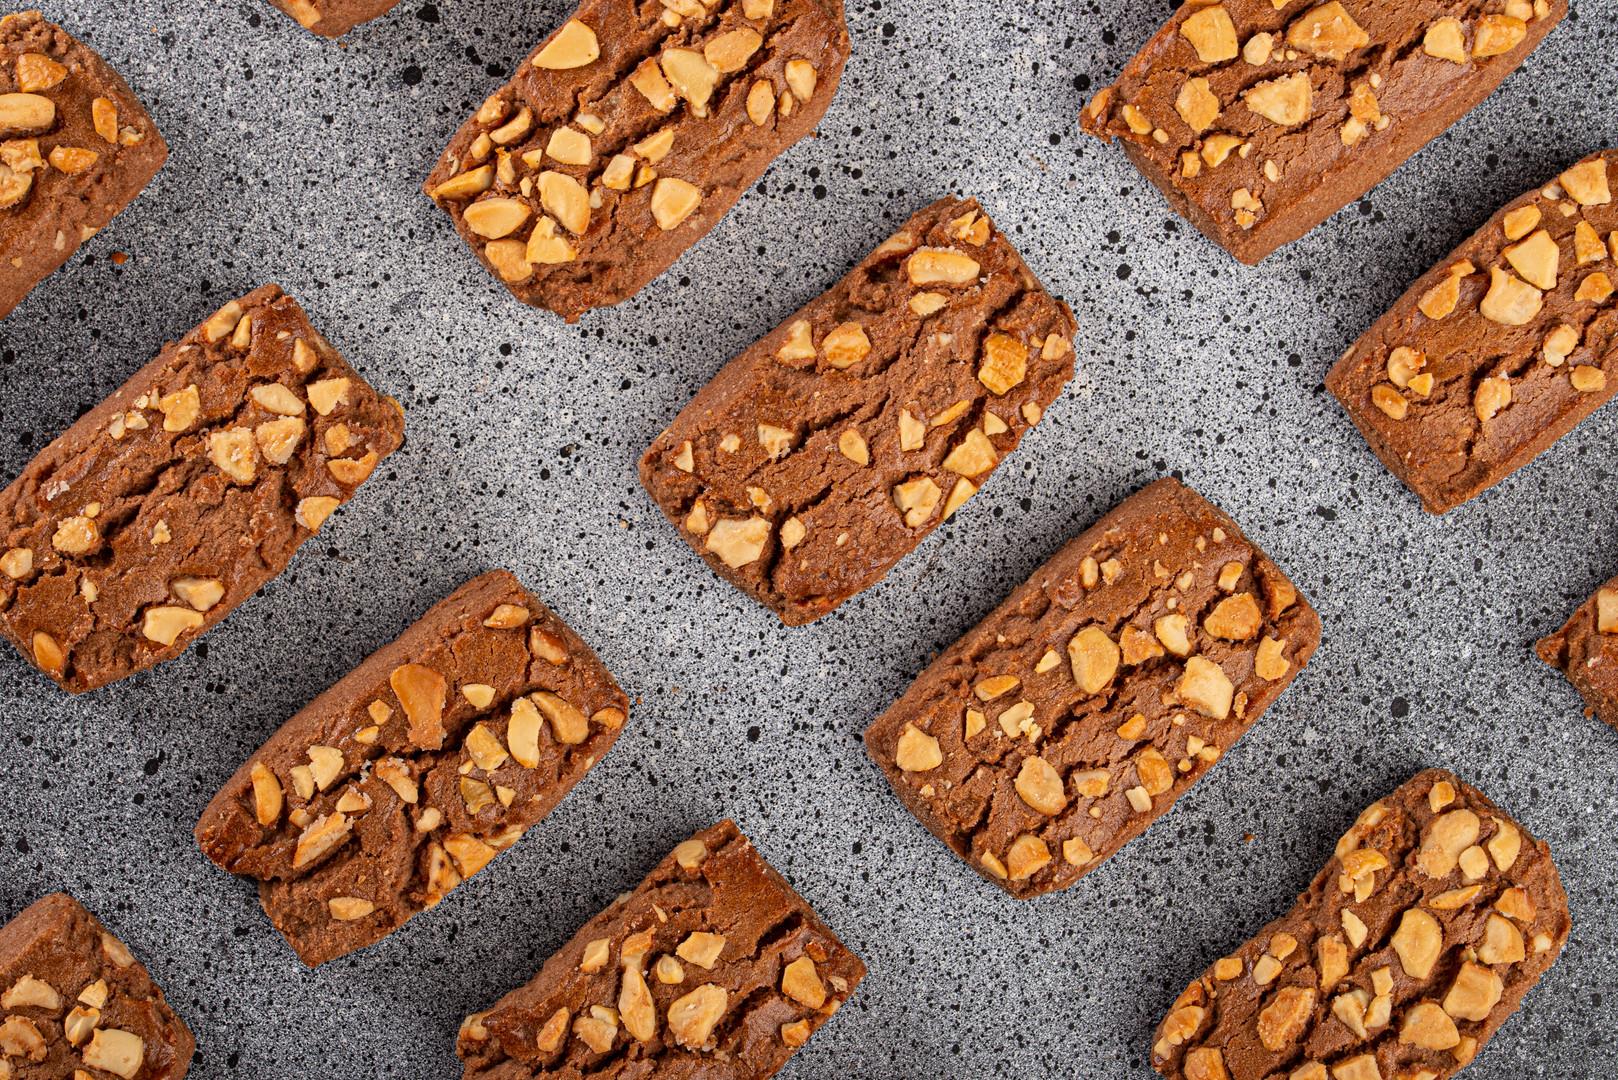 Walnut Biscuit Photography by KS STUDIO